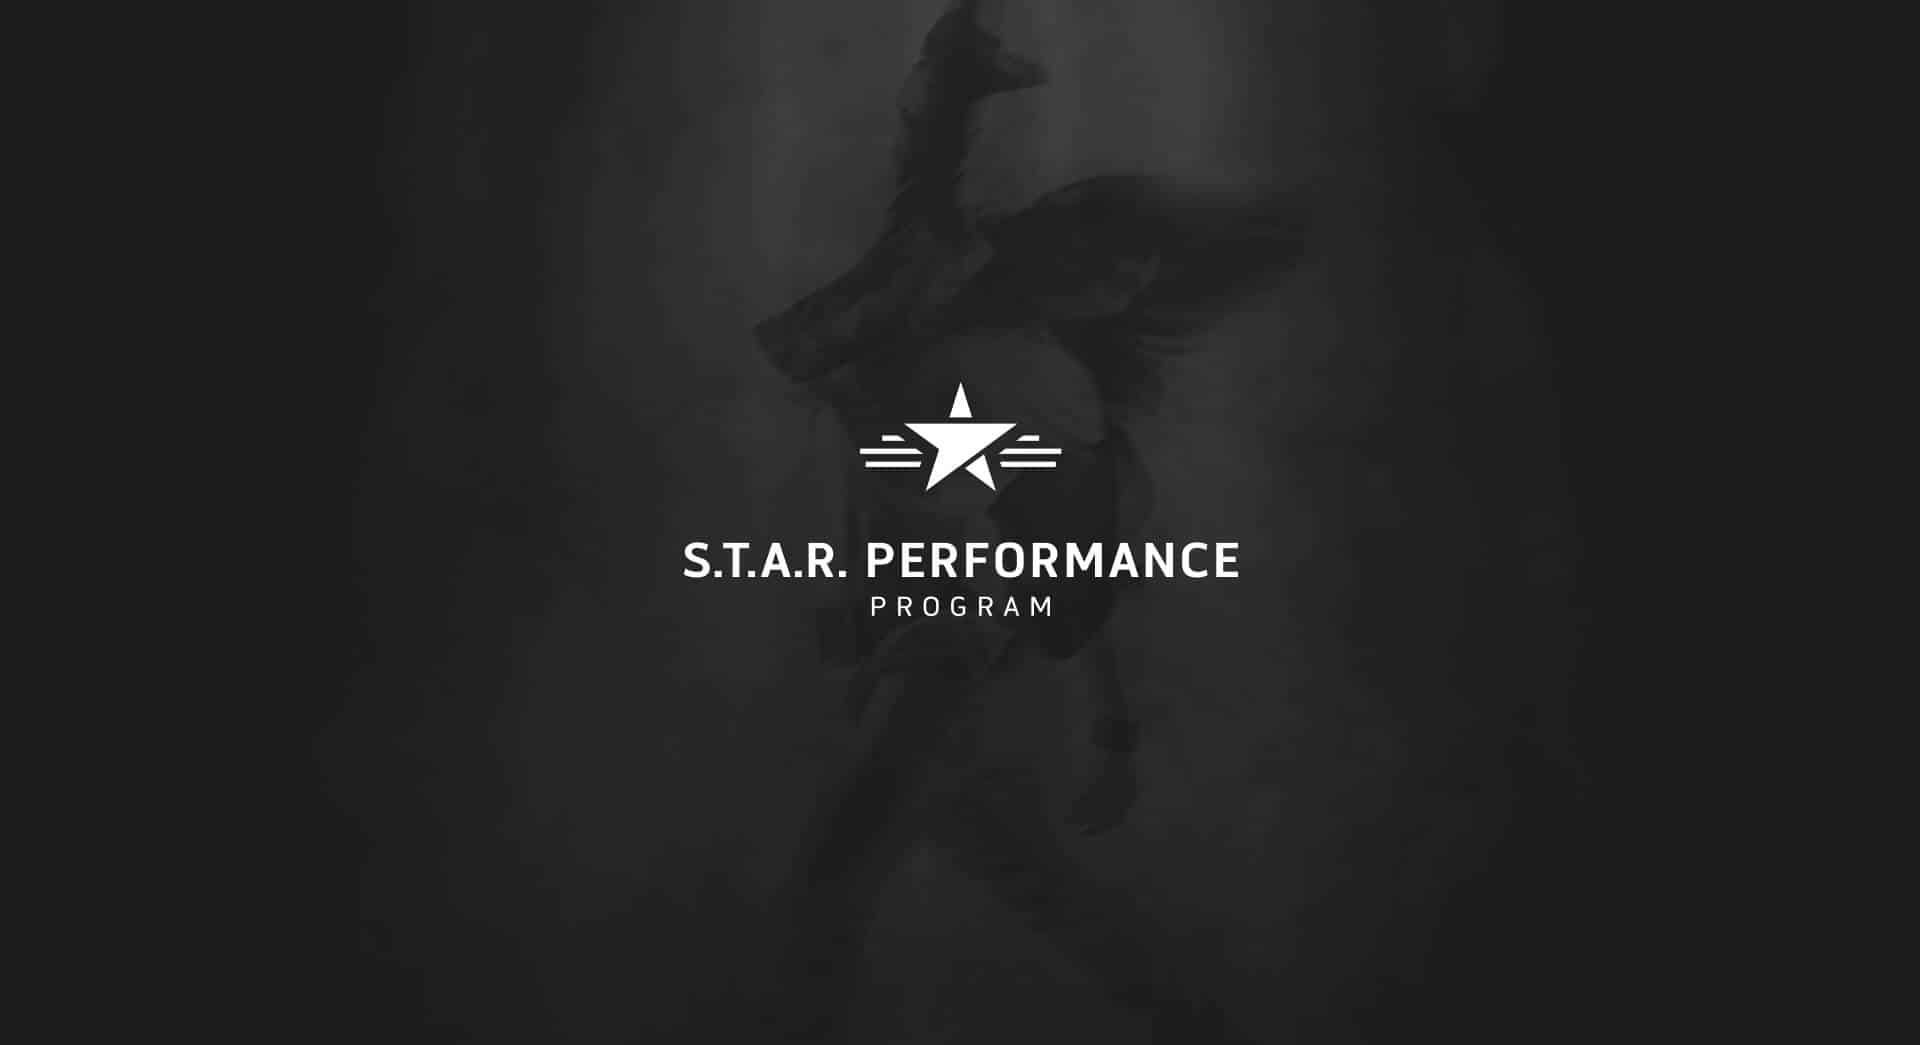 S.T.A.R. Performance Program